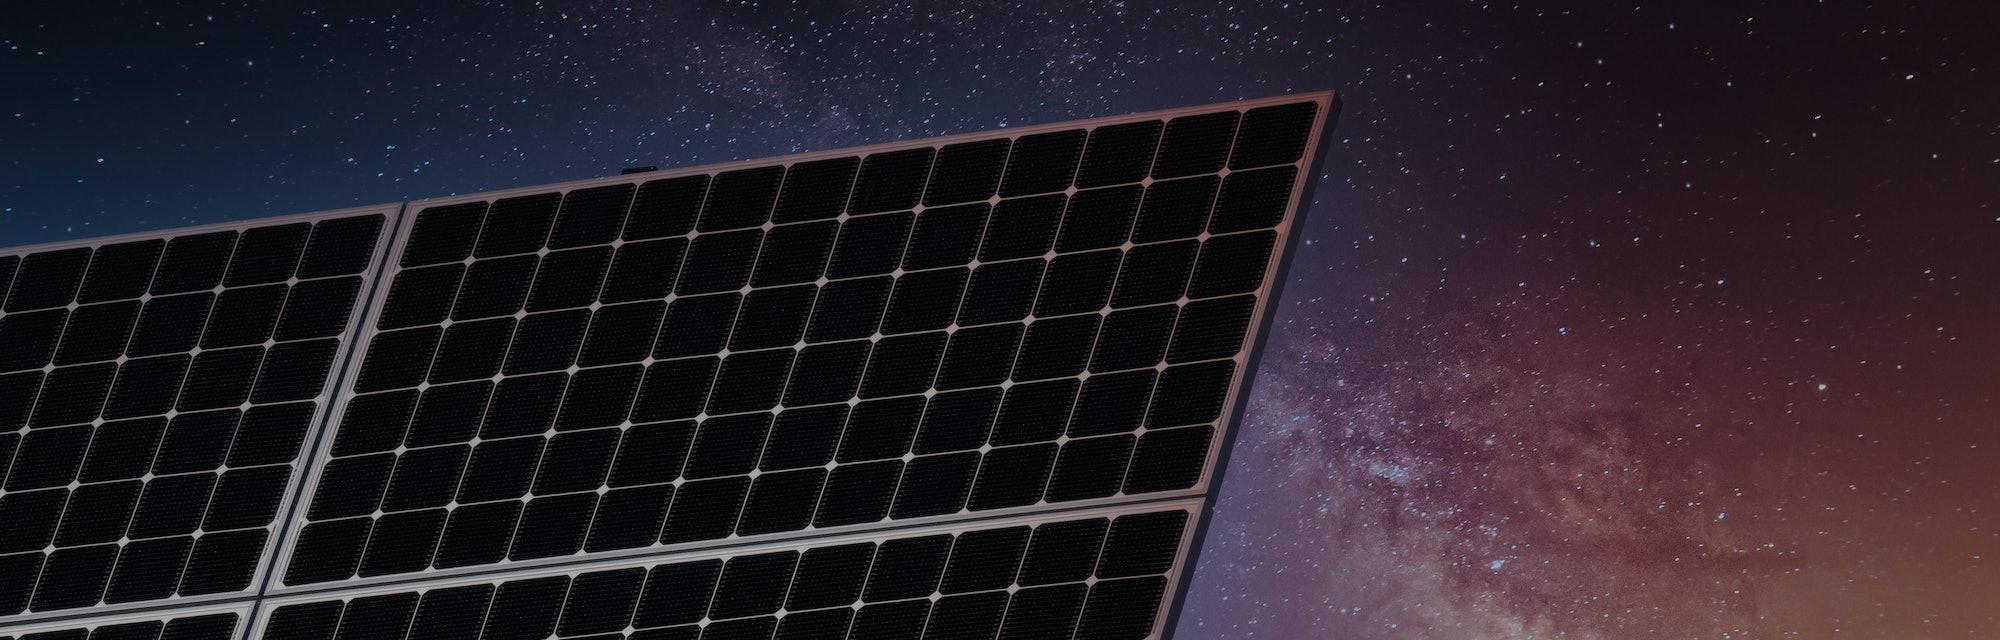 A solar panel seen against the night sky